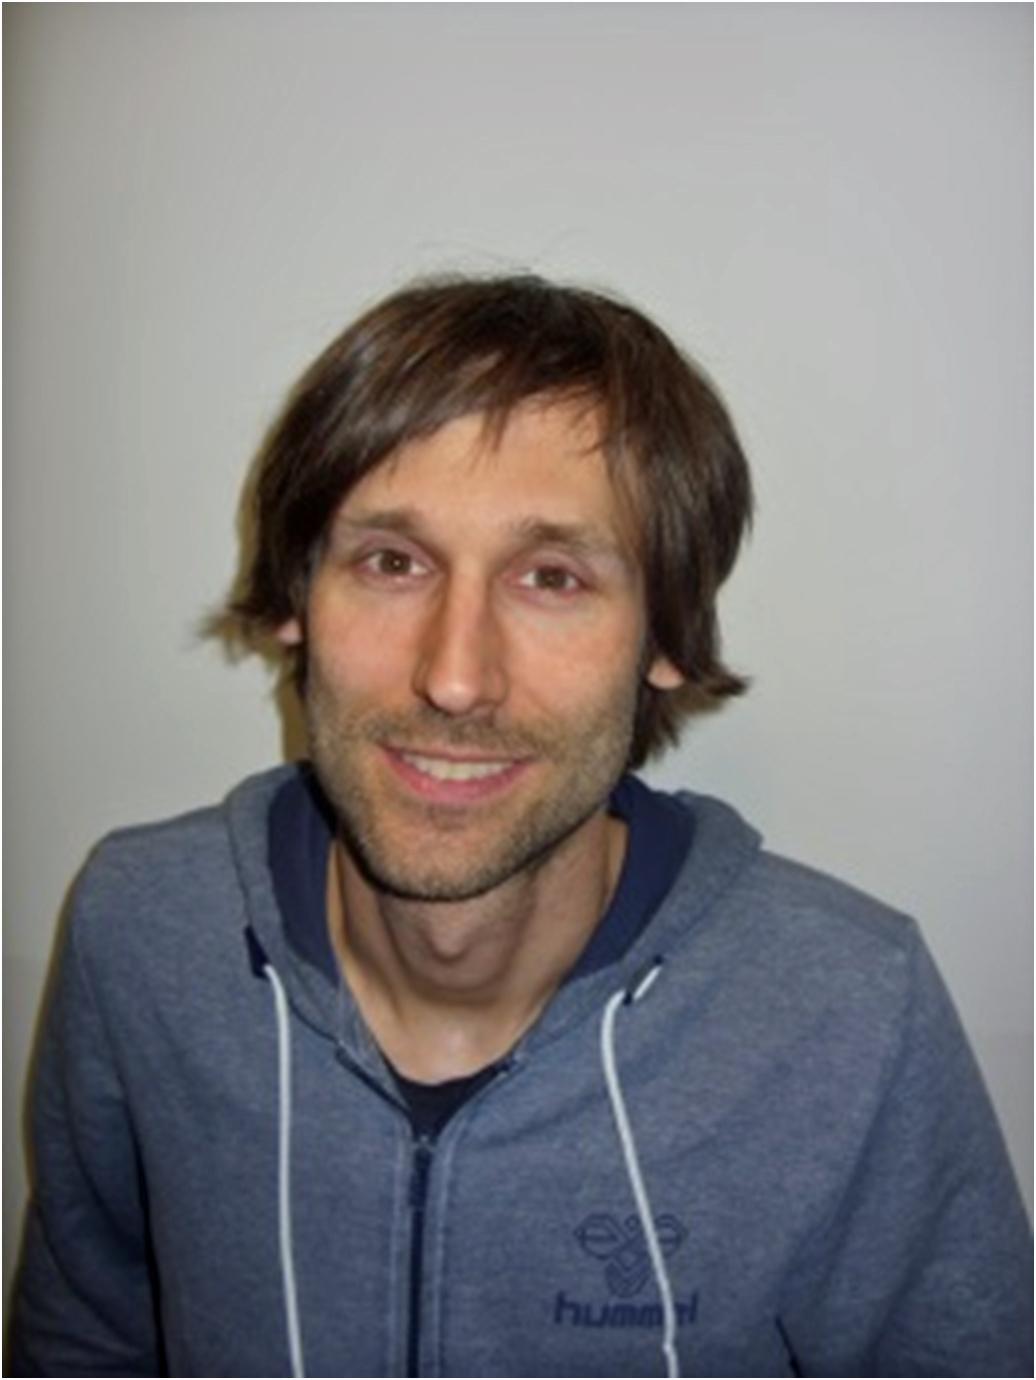 <b>Simon Scholz</b>, Koordinator Realschule - simonscholz